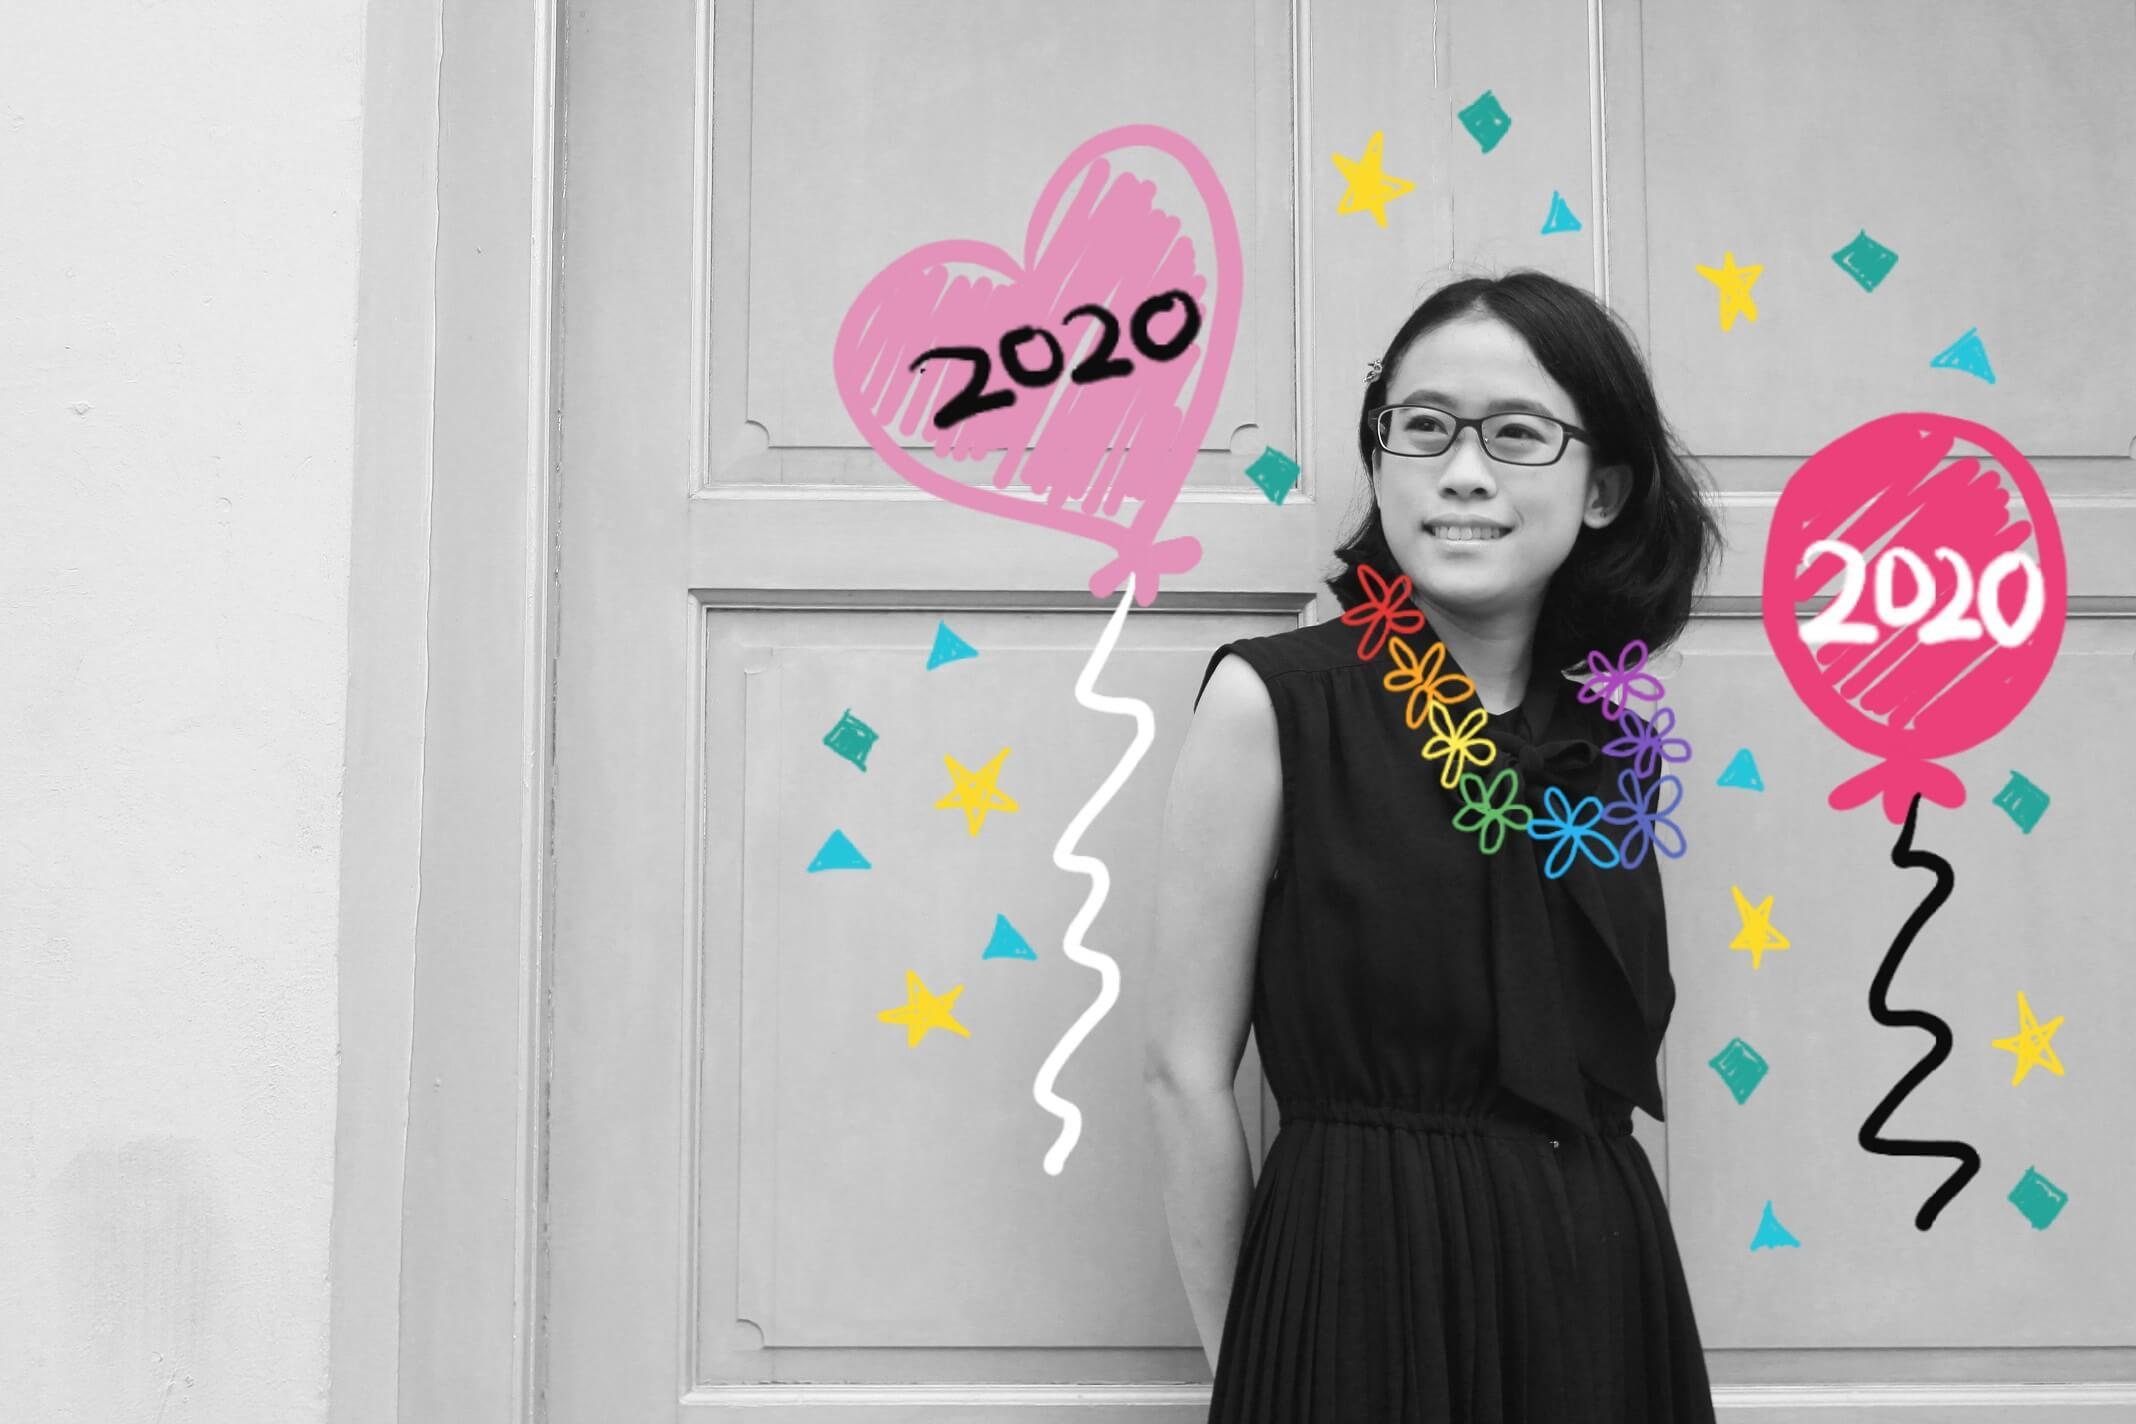 My 2020 birthday